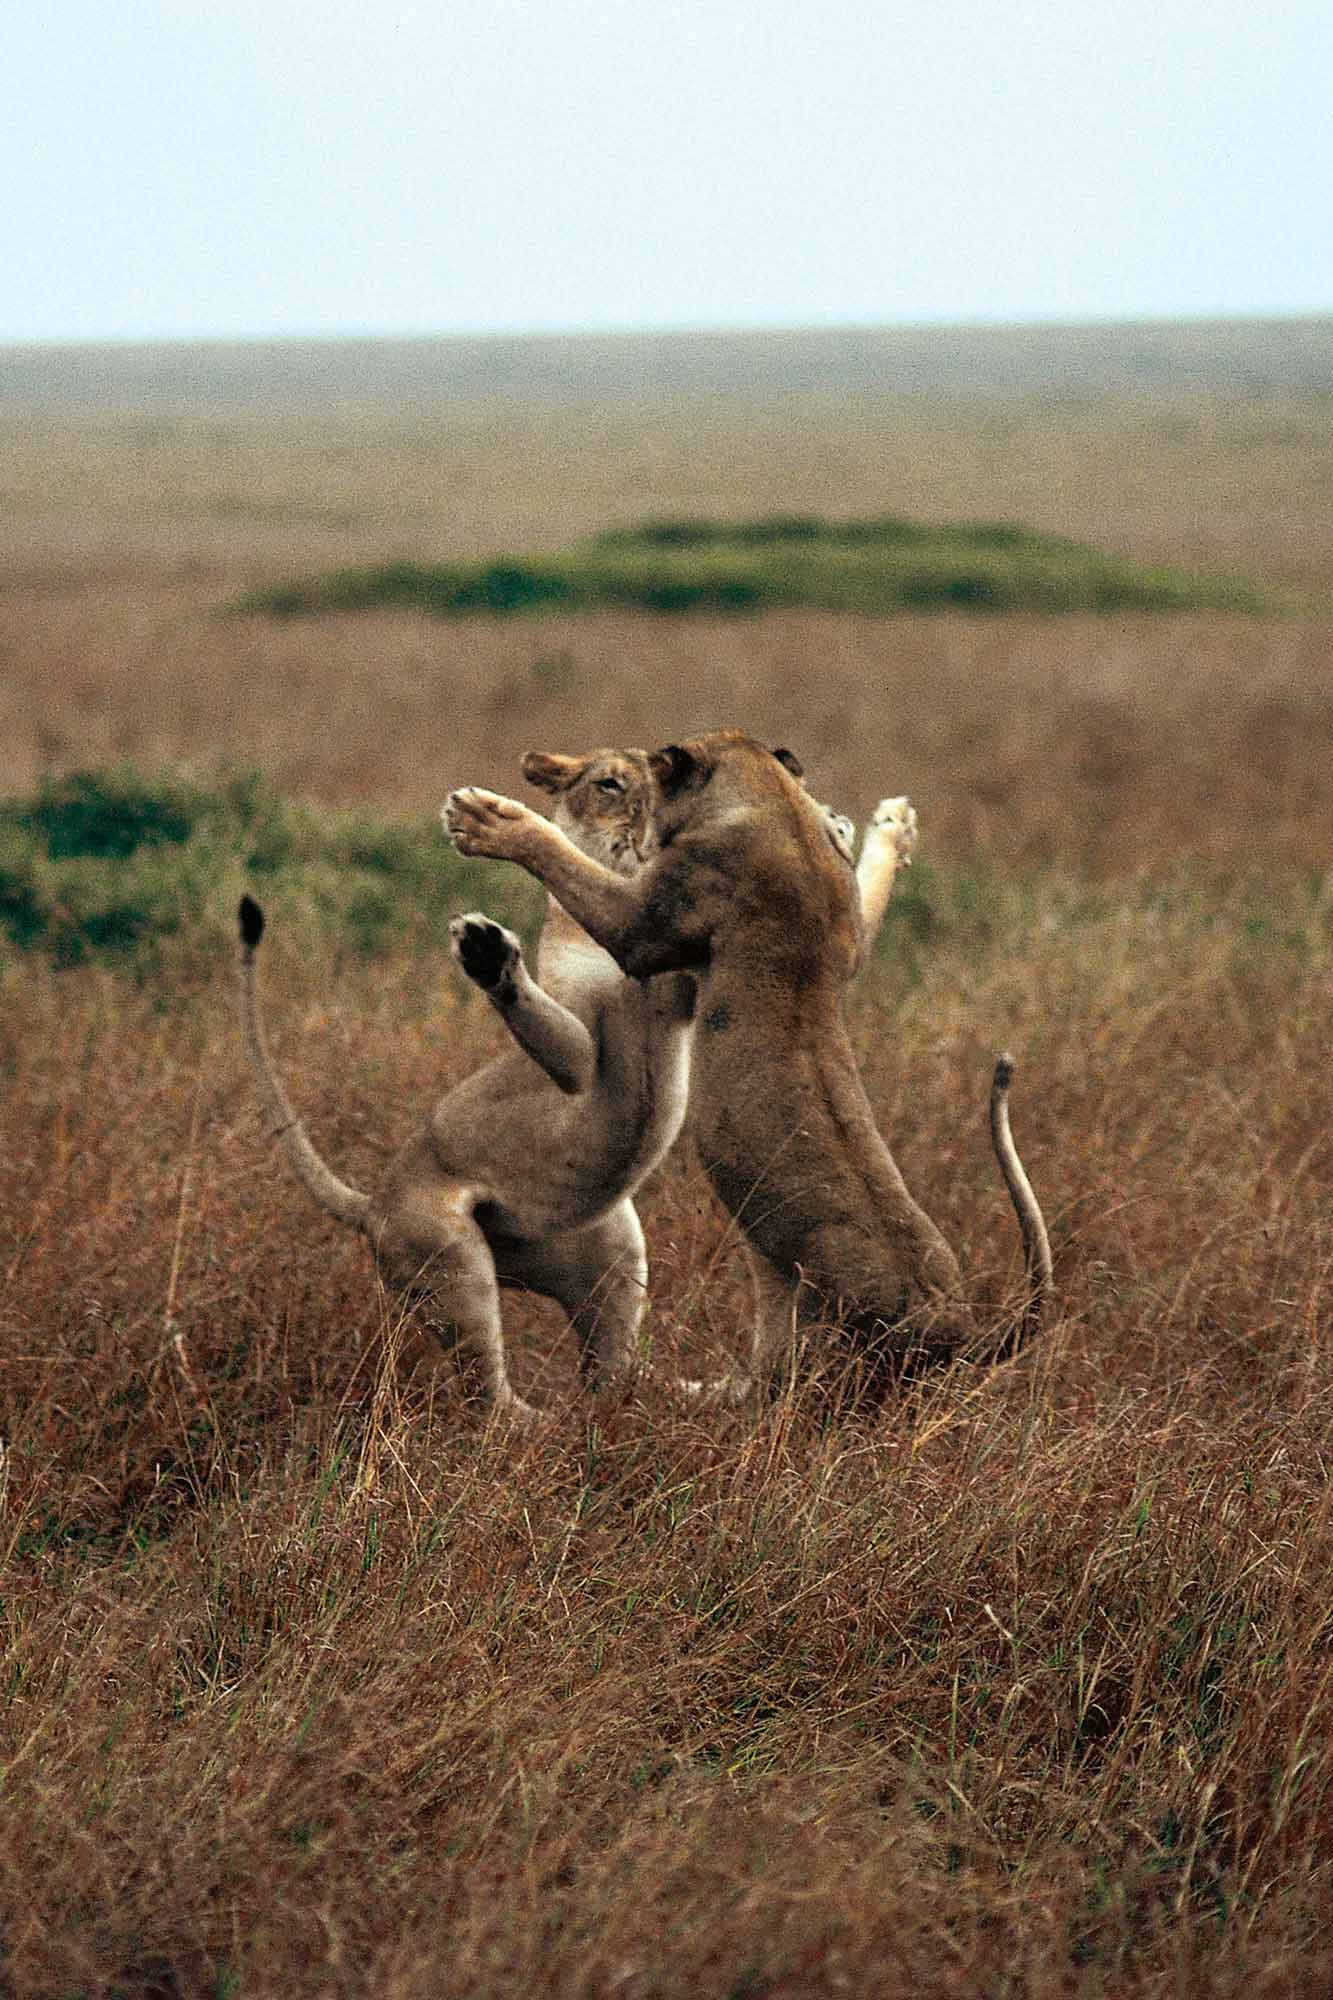 Lionesses - Yann Arthus-Bertrand